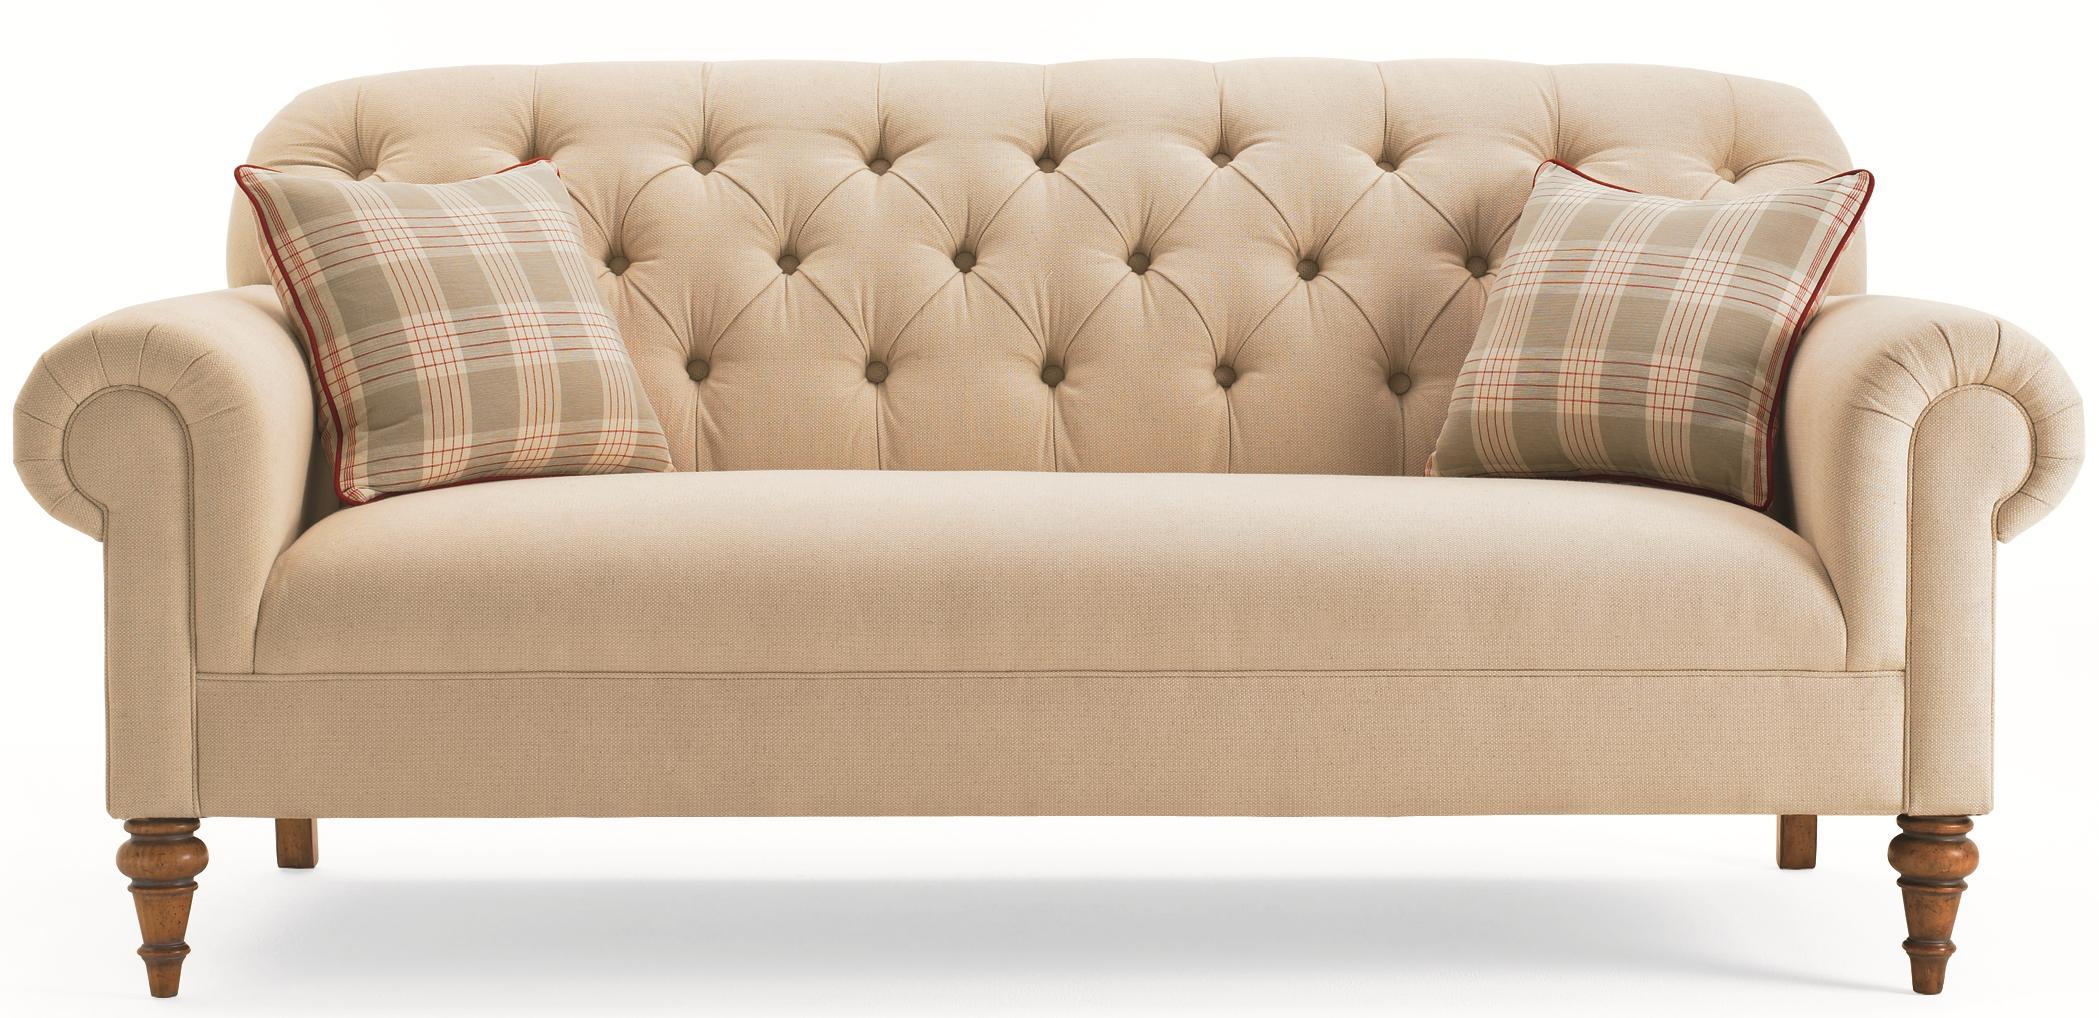 schnadig sofa 9090 nicoletti lipari cream italian leather chaise sofas living furniture dining bedroom upholstery